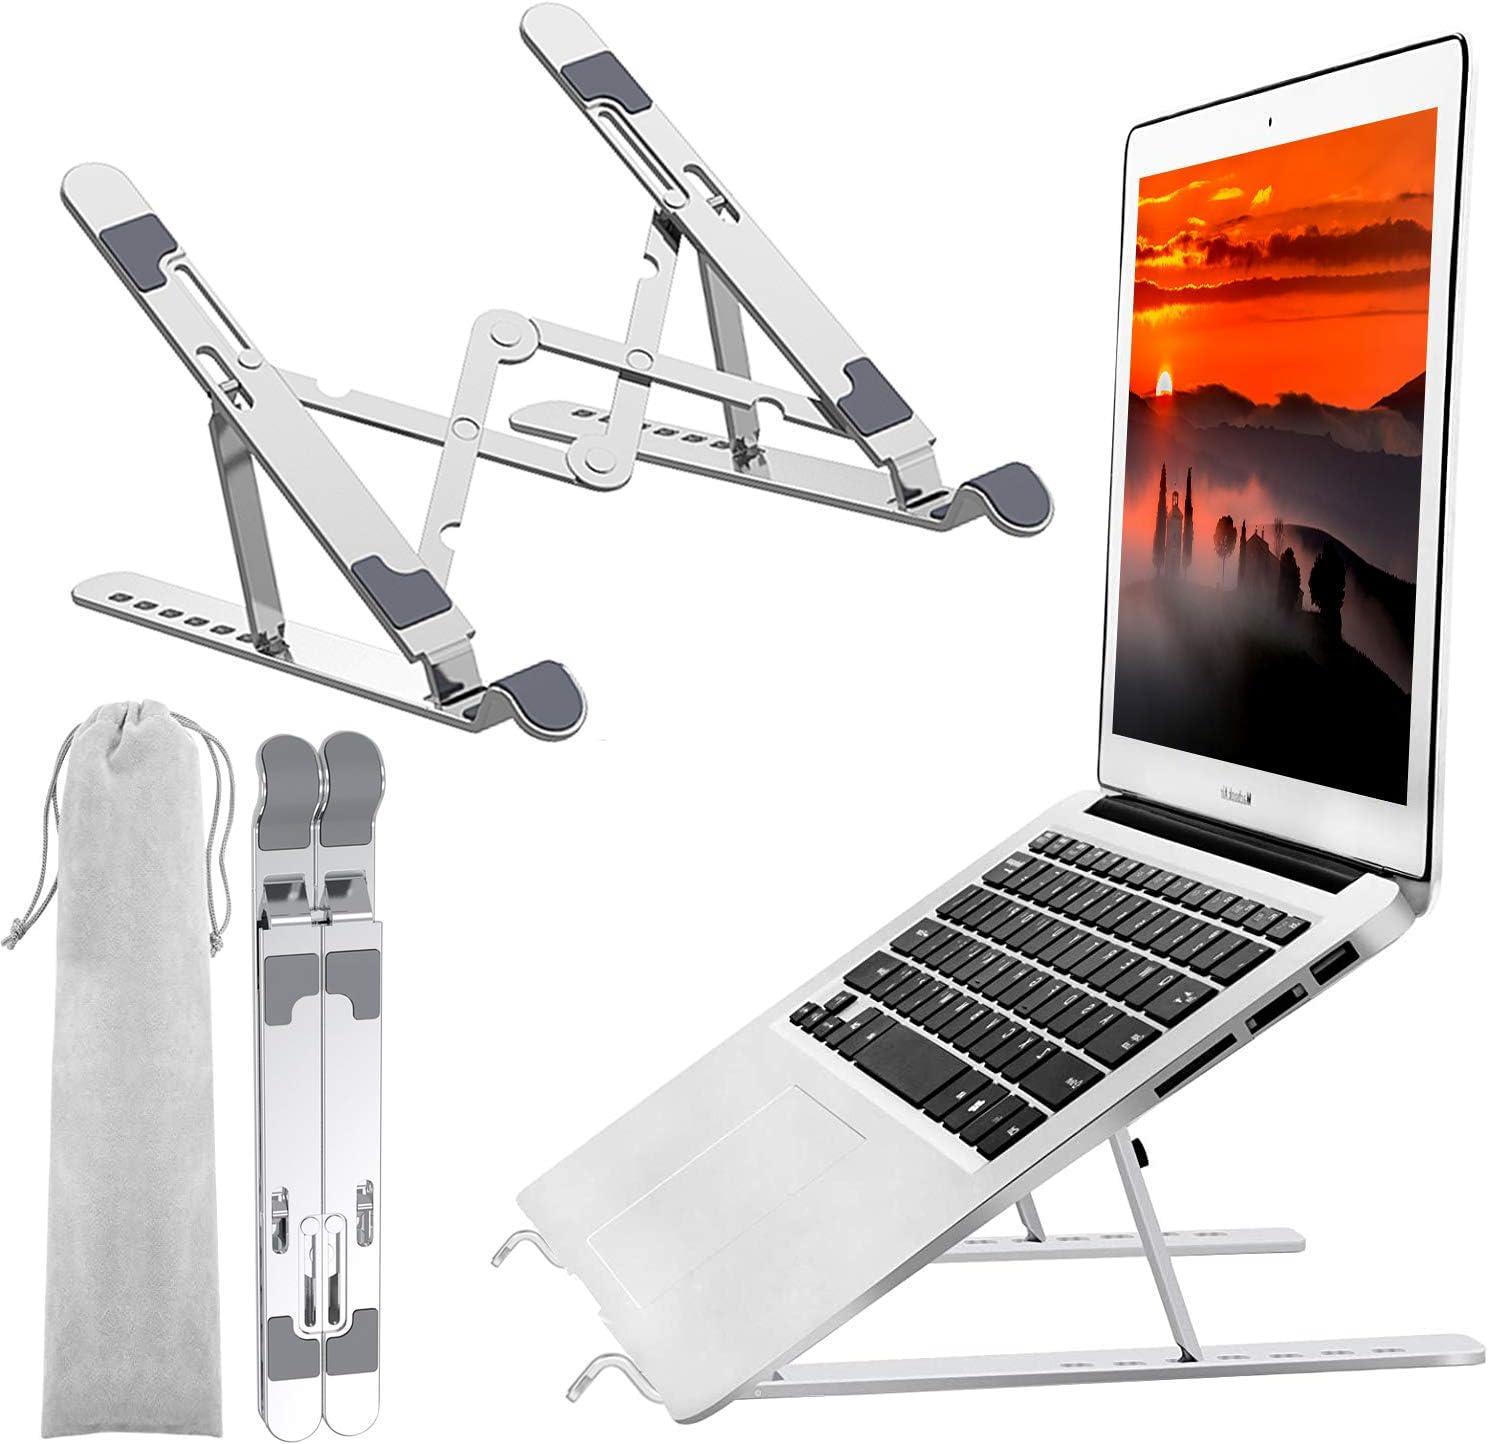 Oceanteda Laptop Max Atlanta Mall 65% OFF Stand Aluminum Adjustable Foldabl